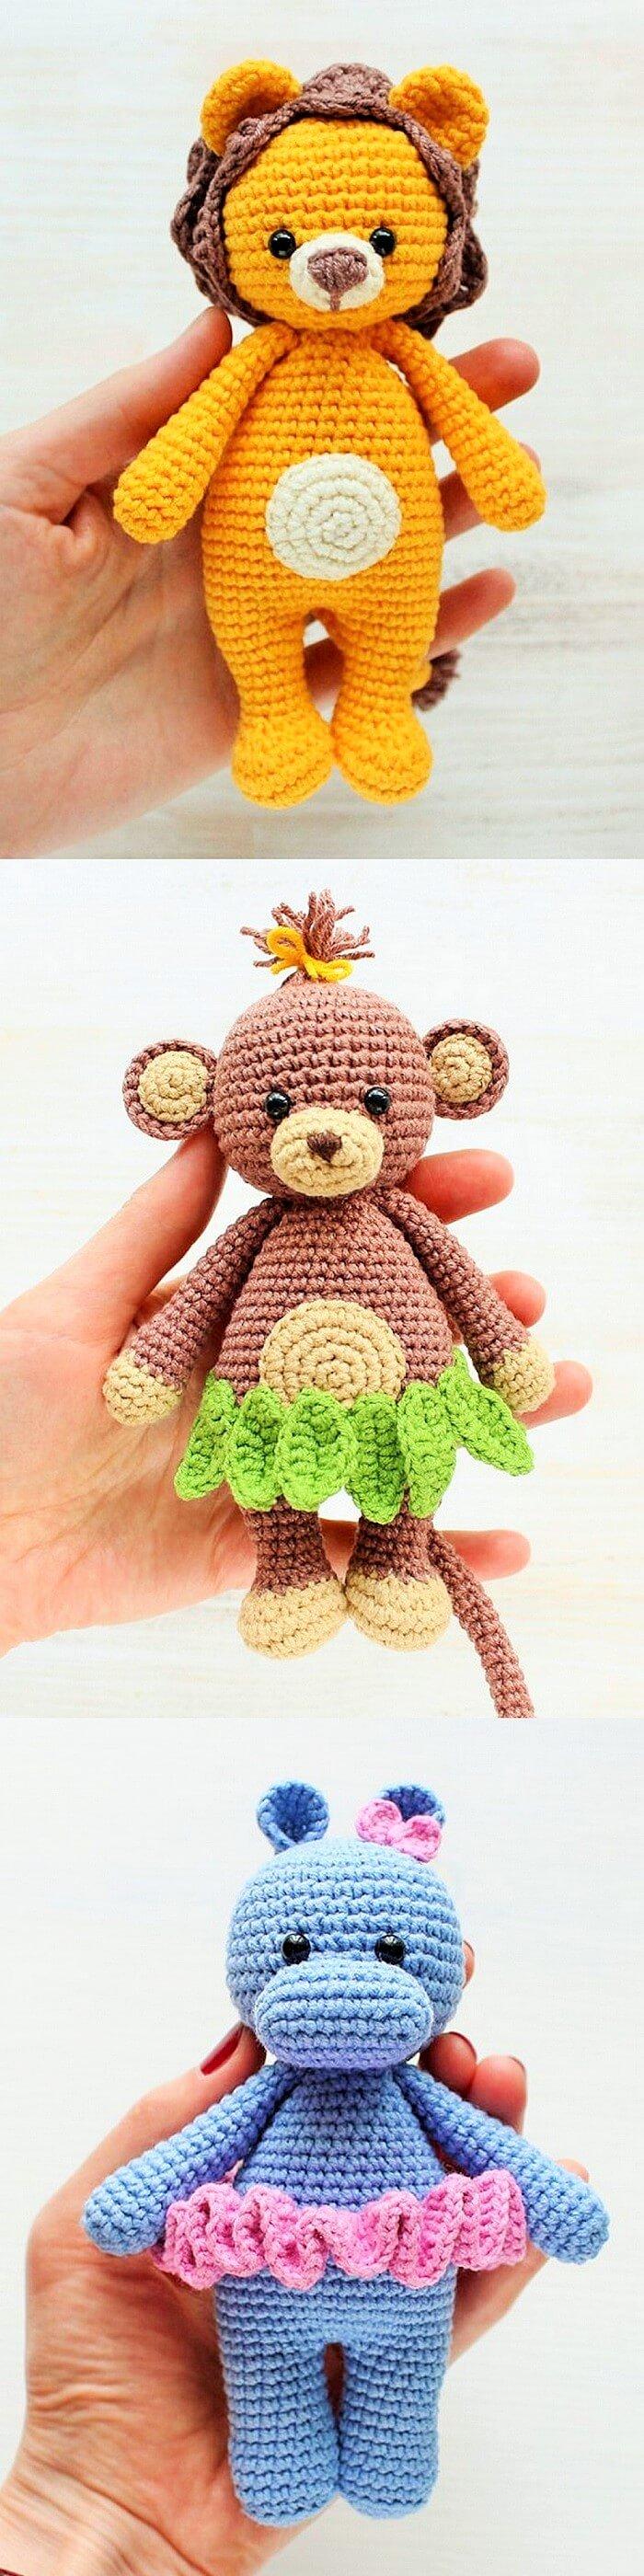 Crochet toys Ideas-3 (2)